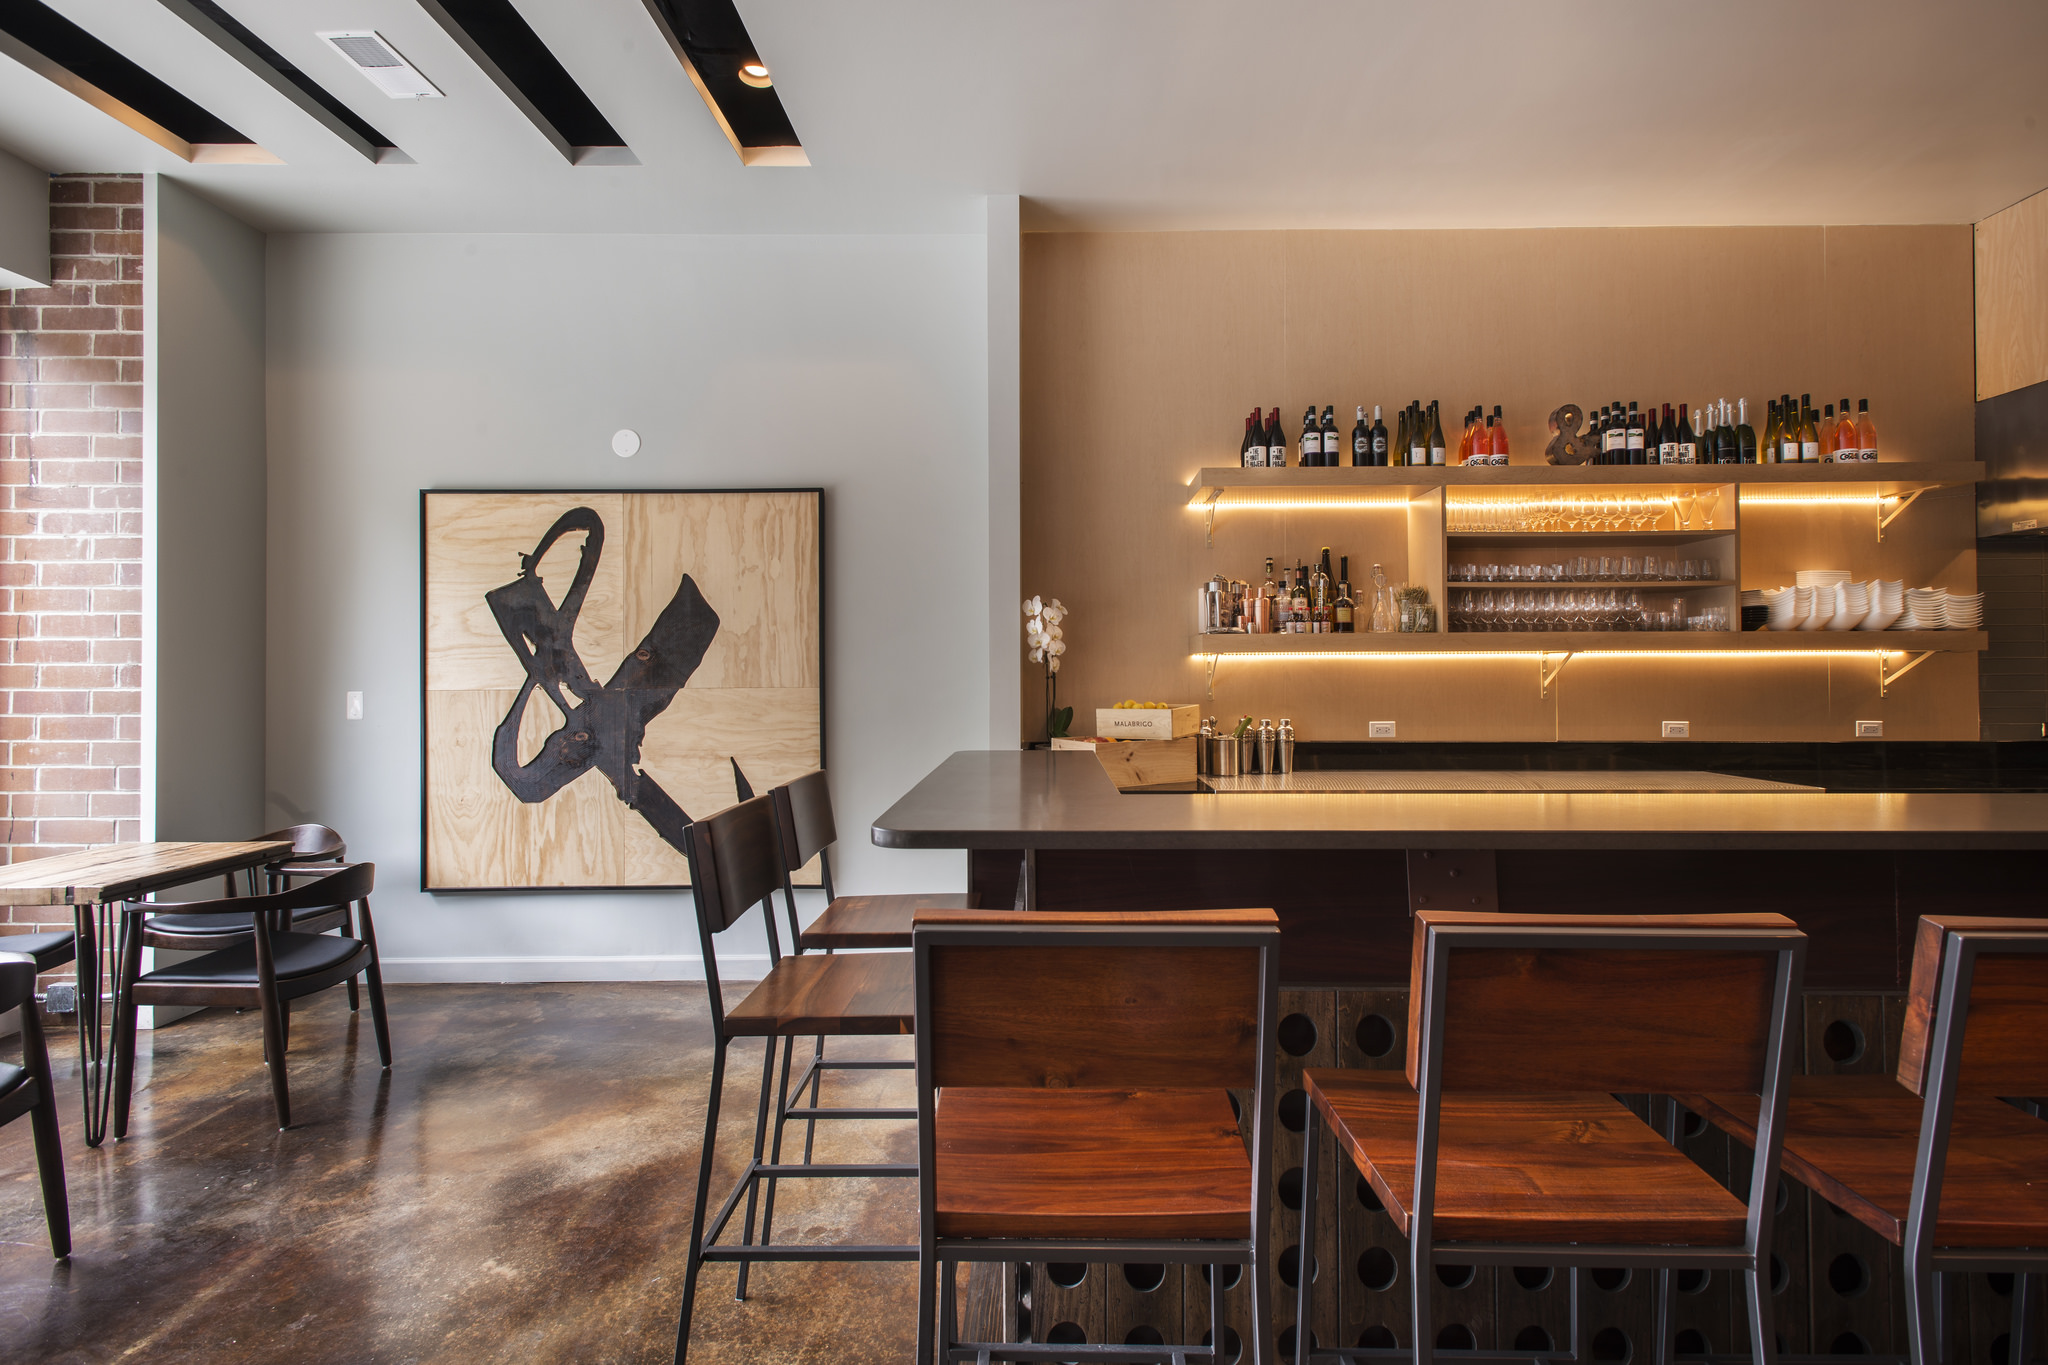 Get a Sneak Peek at Ampersand Wine Bar Before It Opens